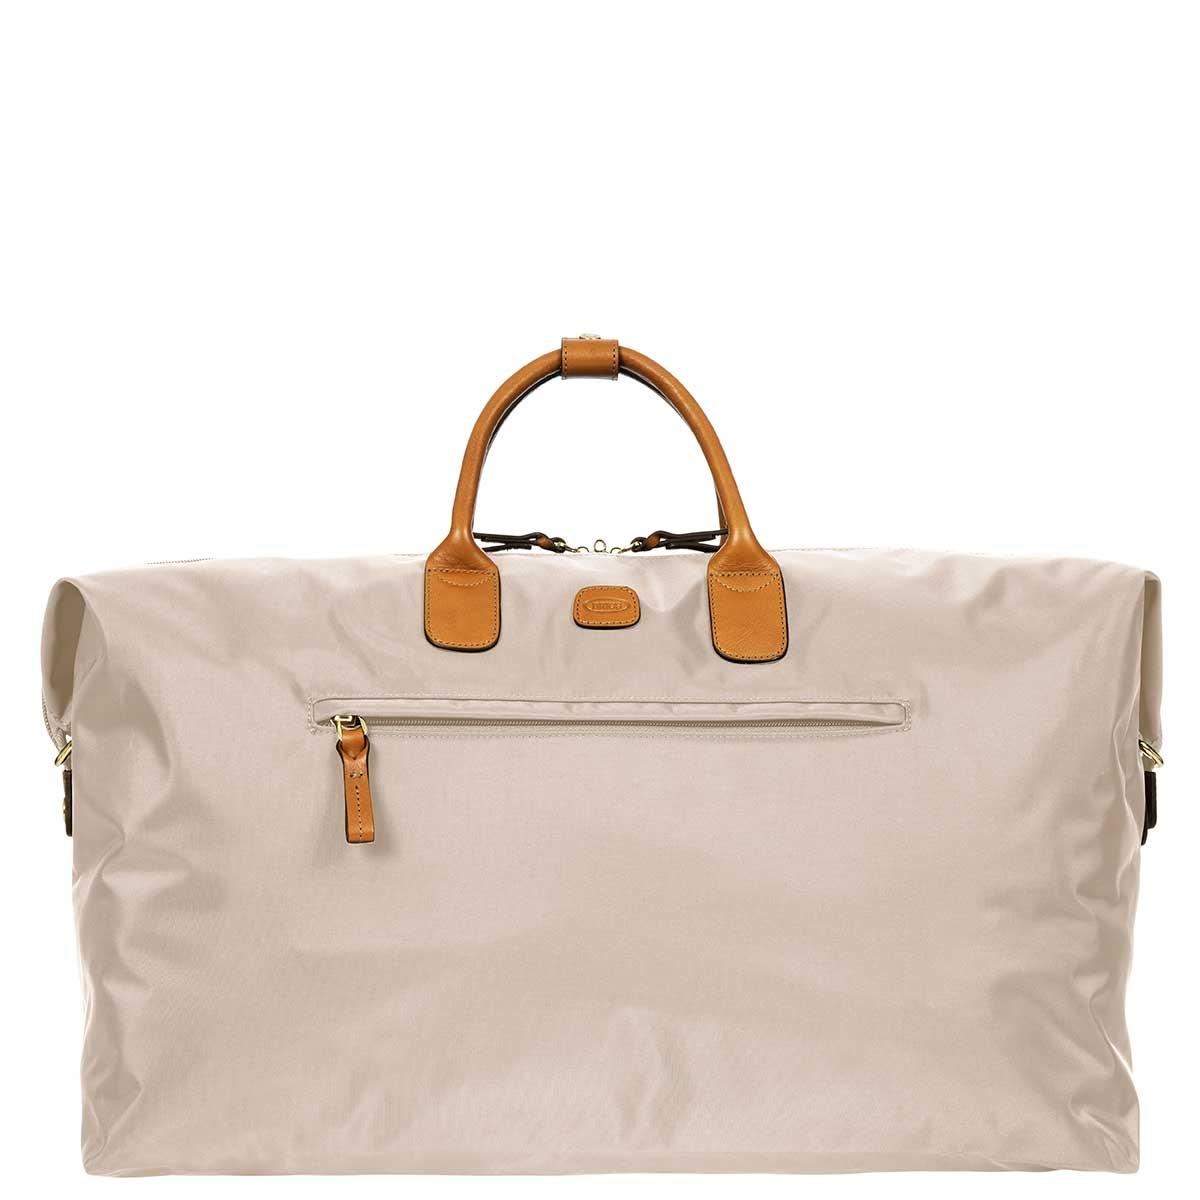 "X-Bag 22"" Deluxe Duffle Bag - papyrus | BRIC'S Travel Bag"